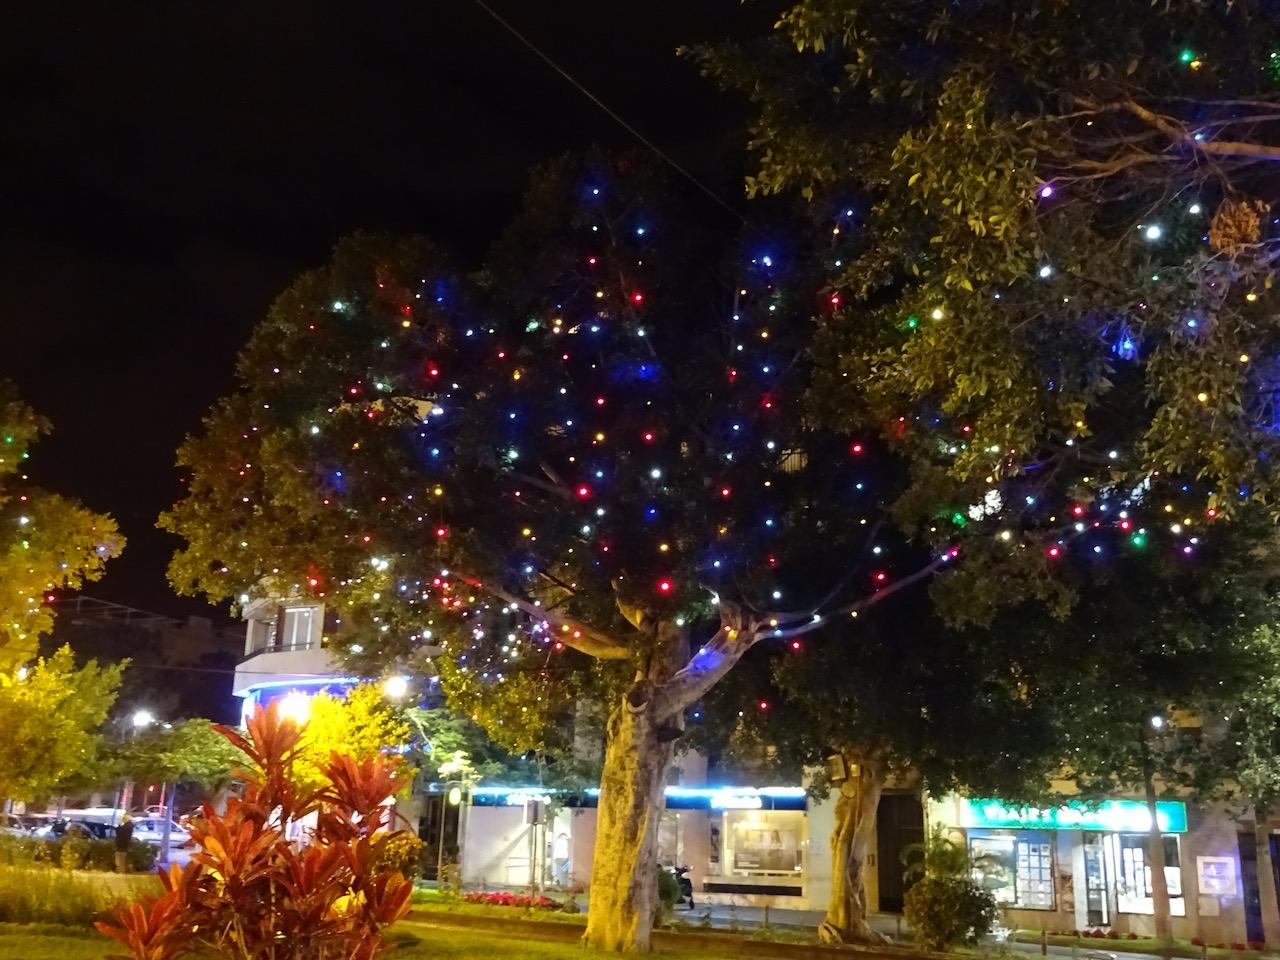 Weihnachtsbeleuchtung 1